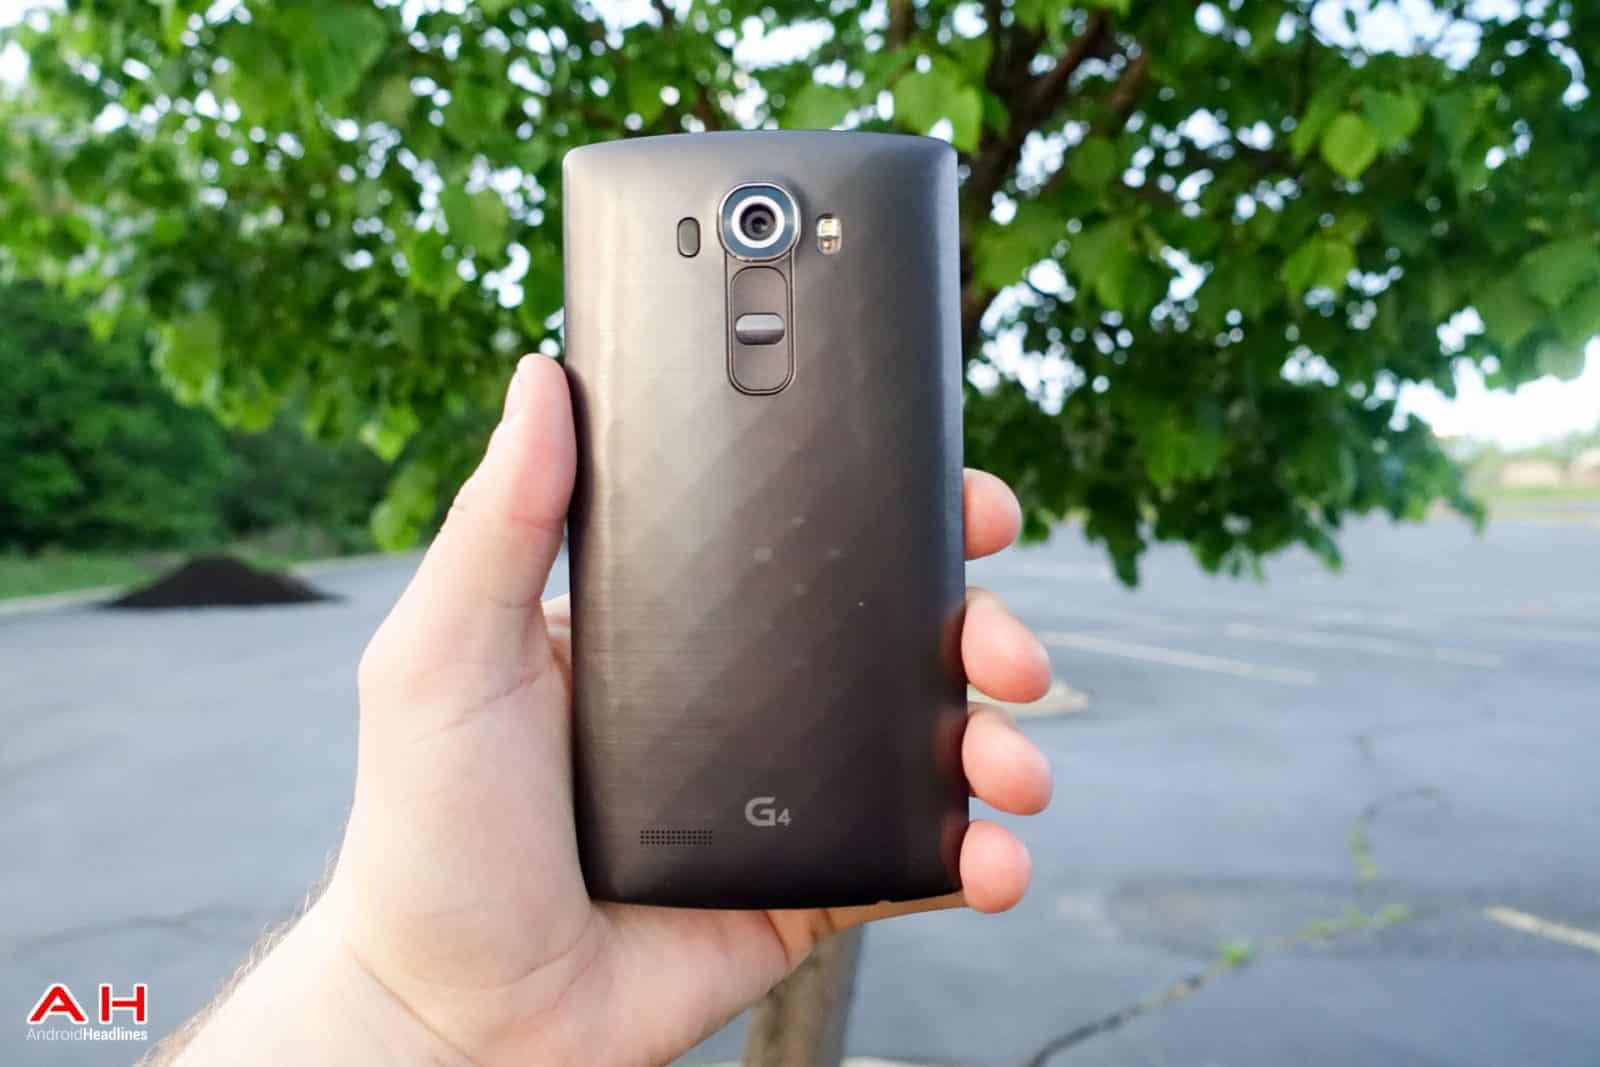 LG-G4-AH-3